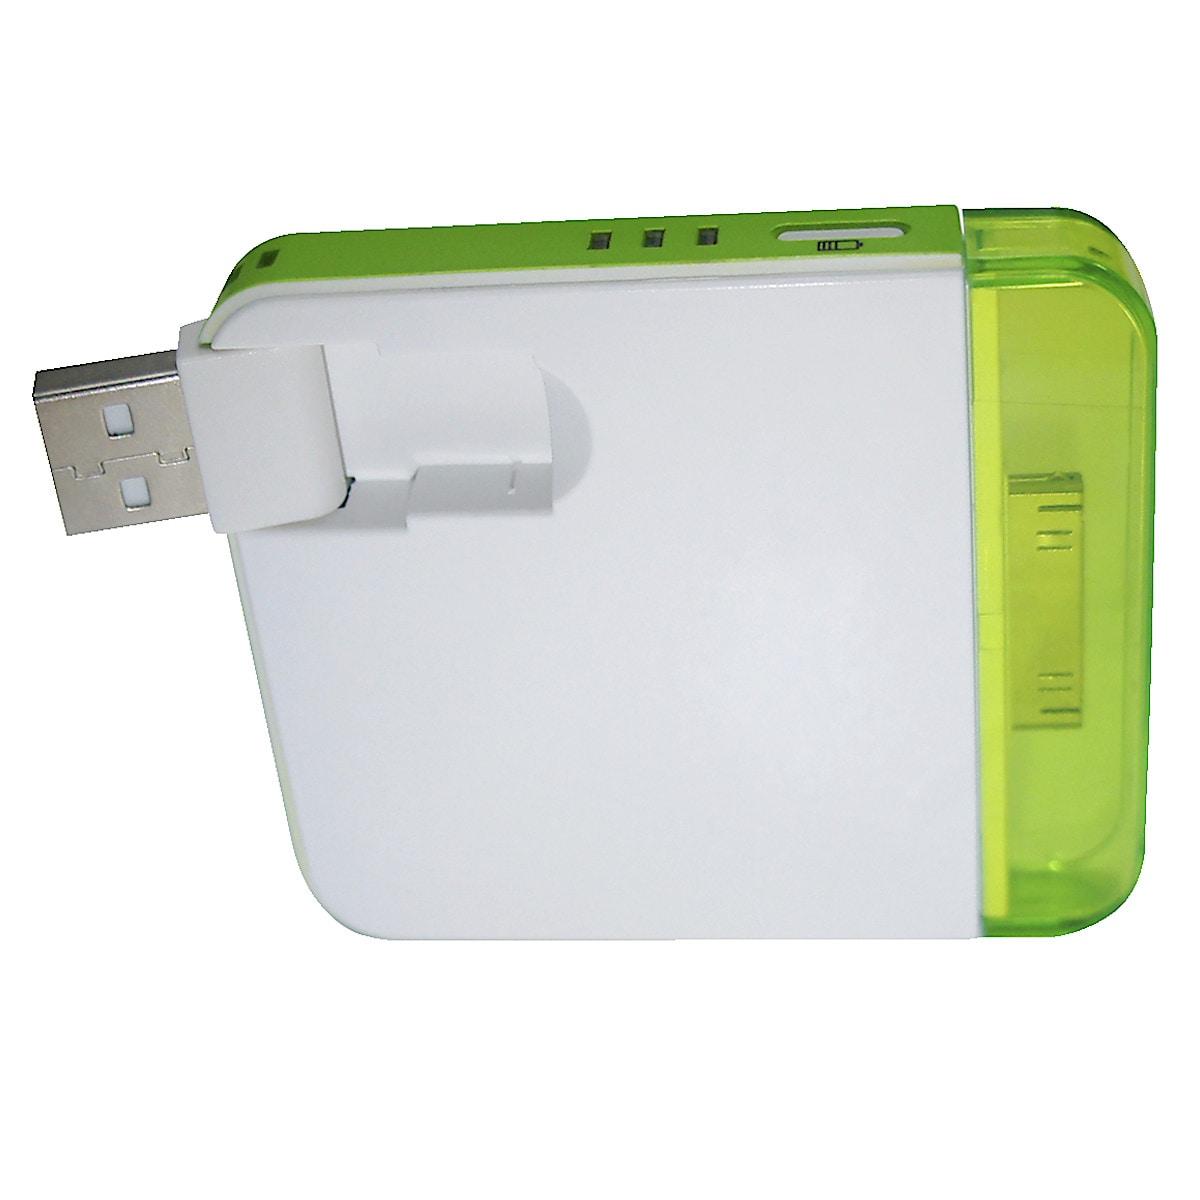 Powerbank för iPhone/iPod